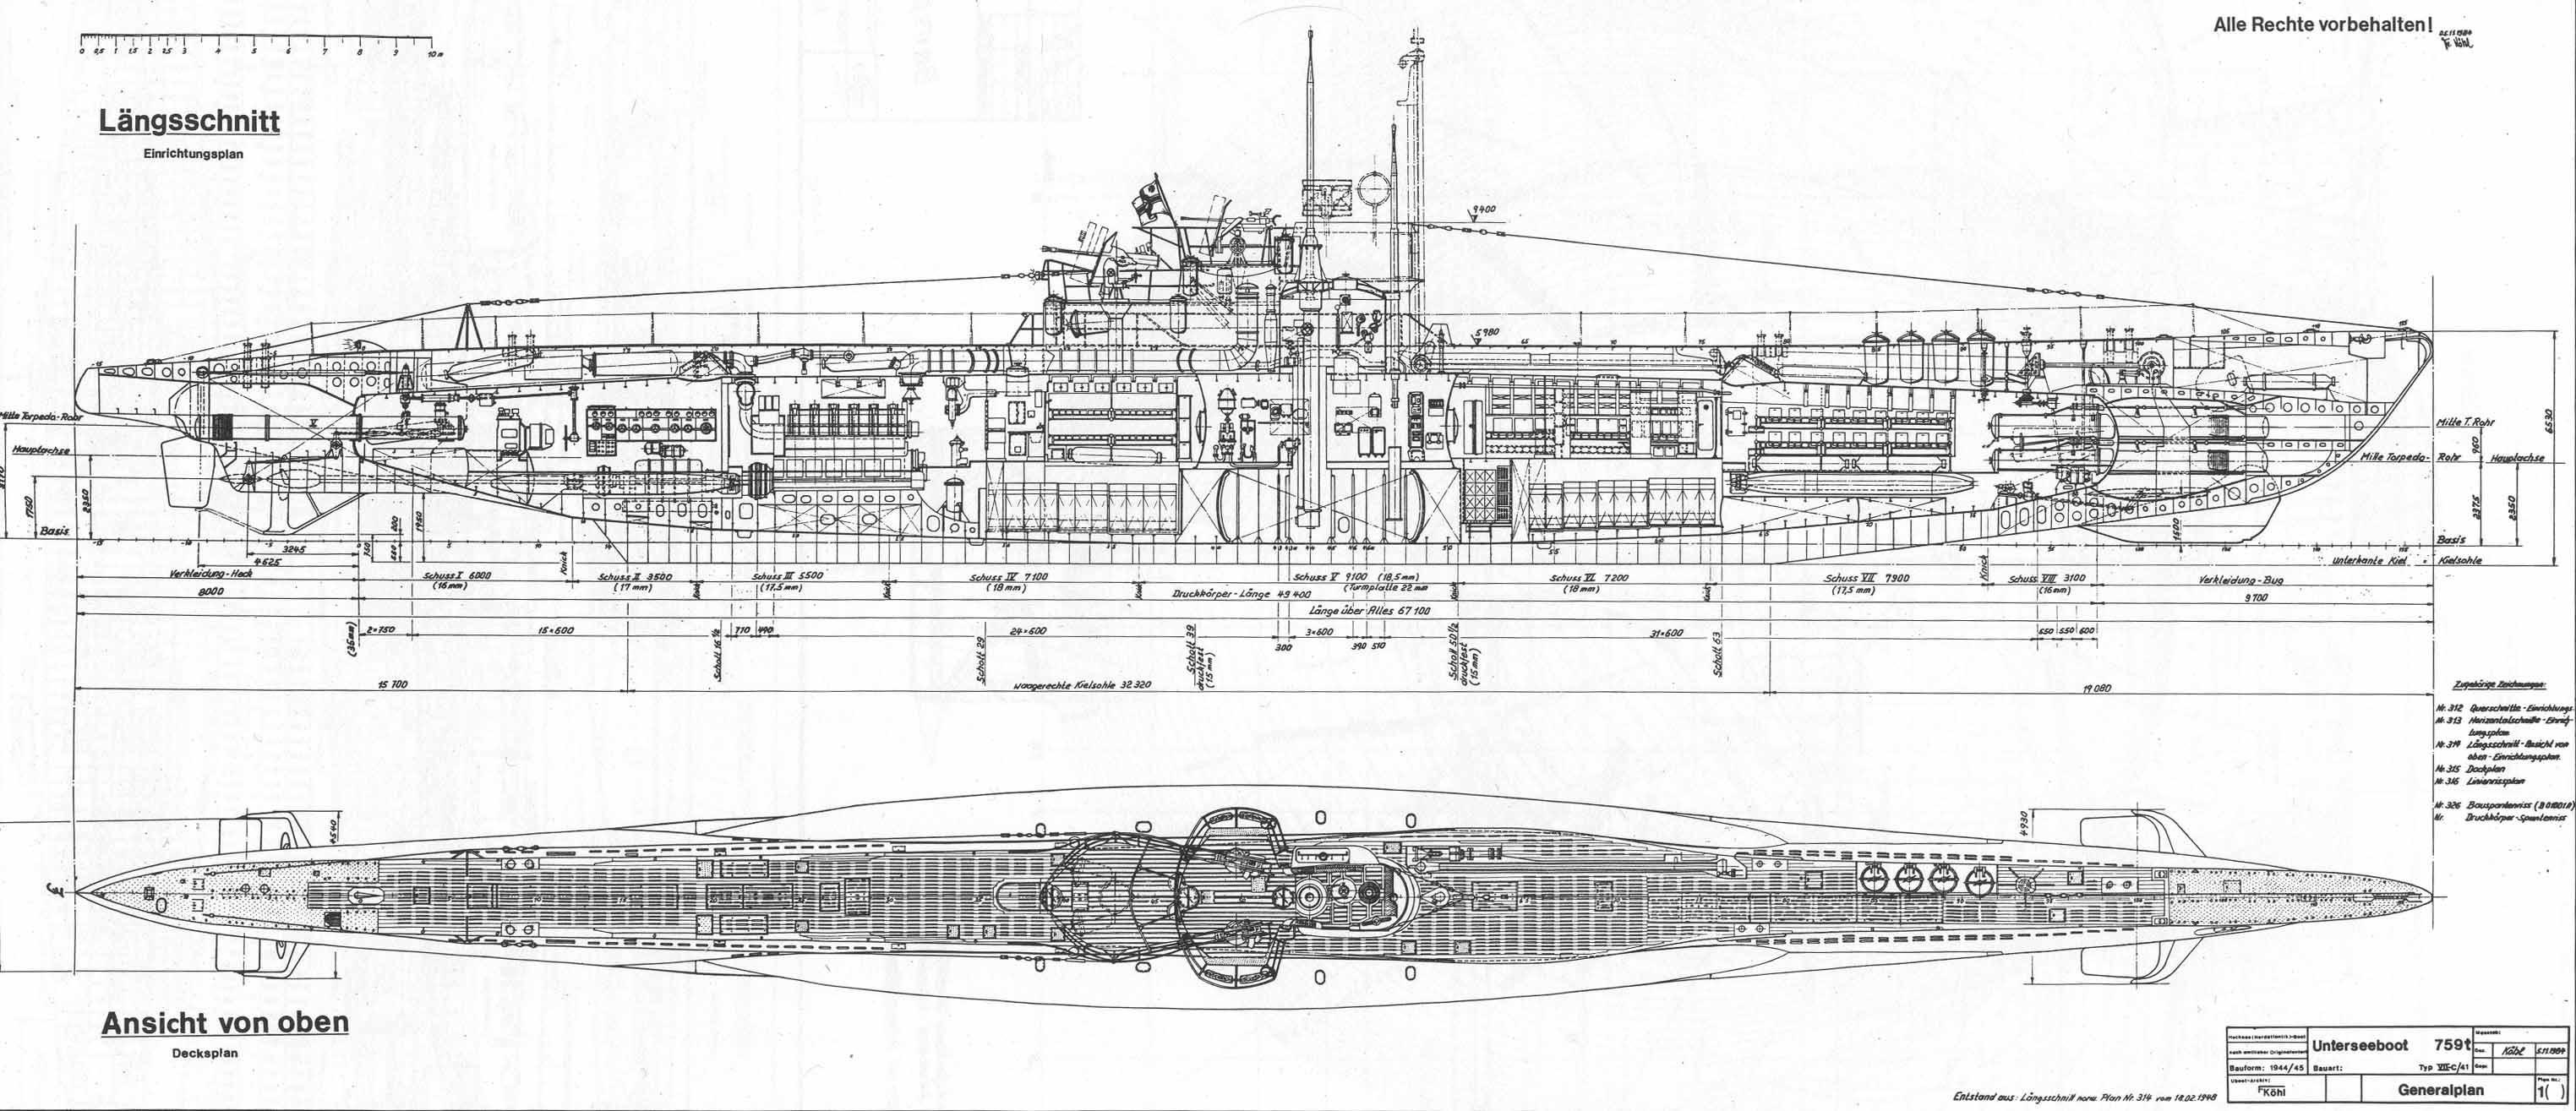 Foto-u-bootflottille-unterseeboot Flottilie-sm U 17 U-boot-feindfahrt-1.wk-15 Ruf Zuerst 1871-1918 Fotos, Briefe & Postkarten